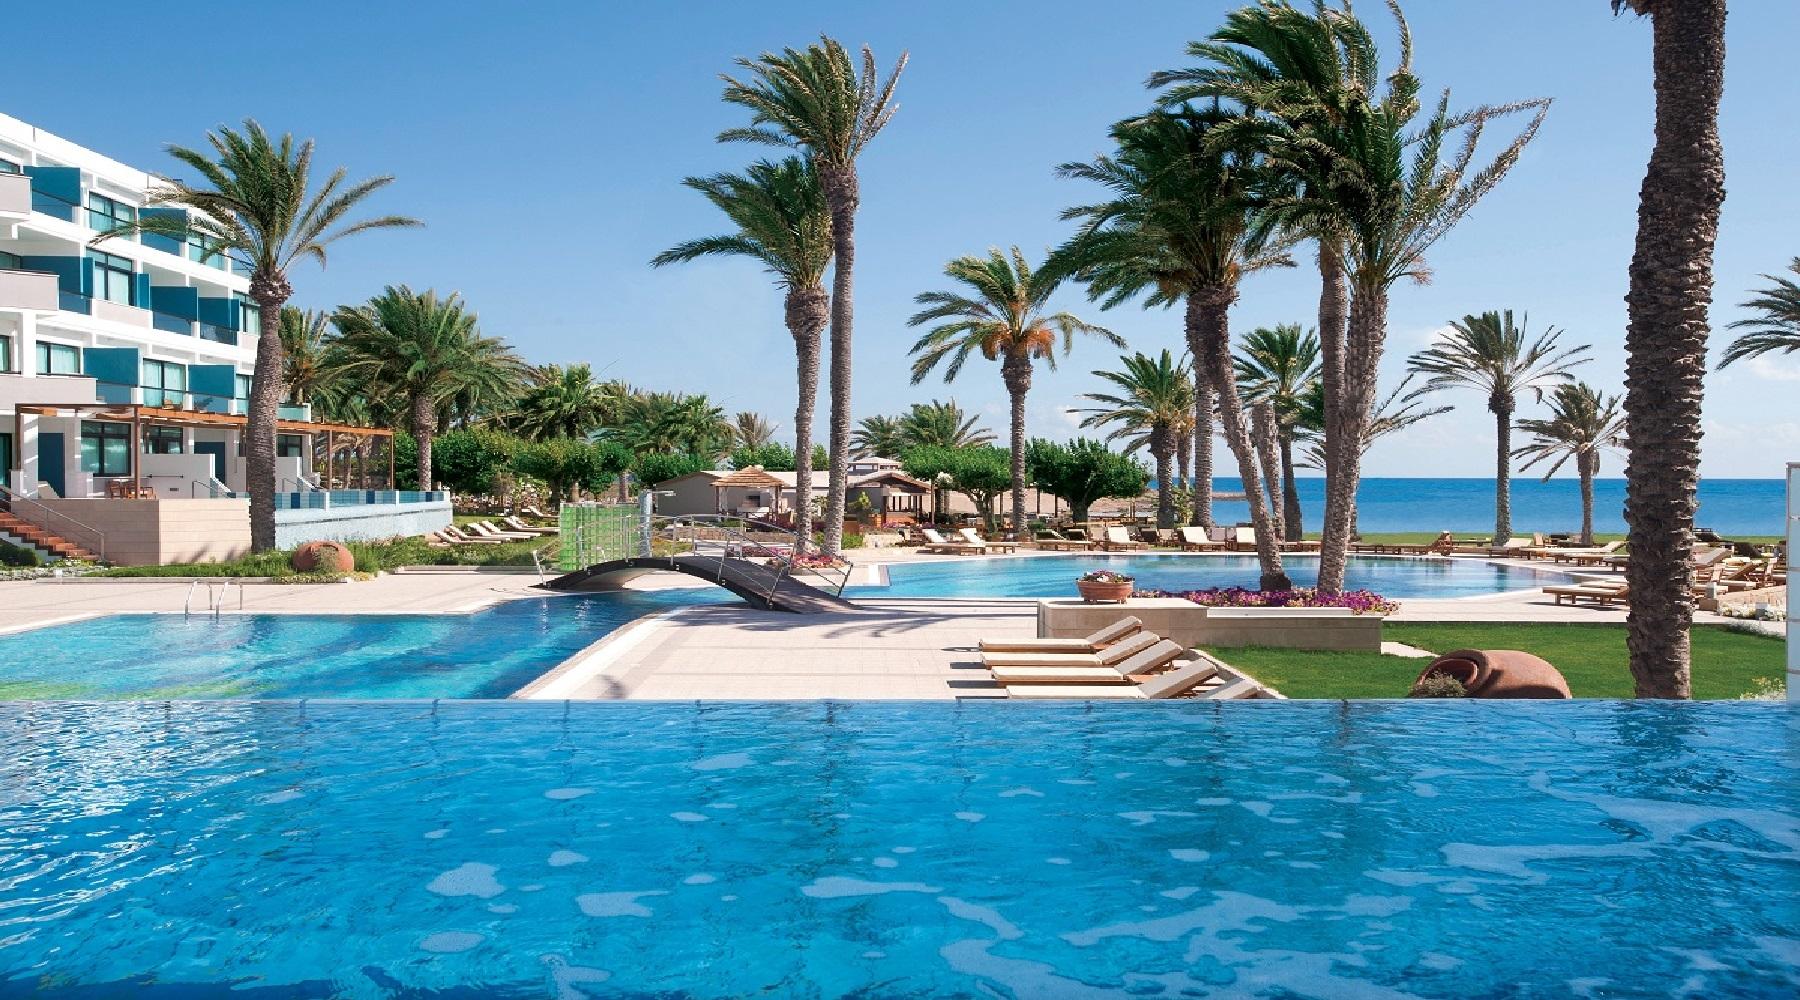 Asimina Suites Hotel Constantinou Bros, Pafos